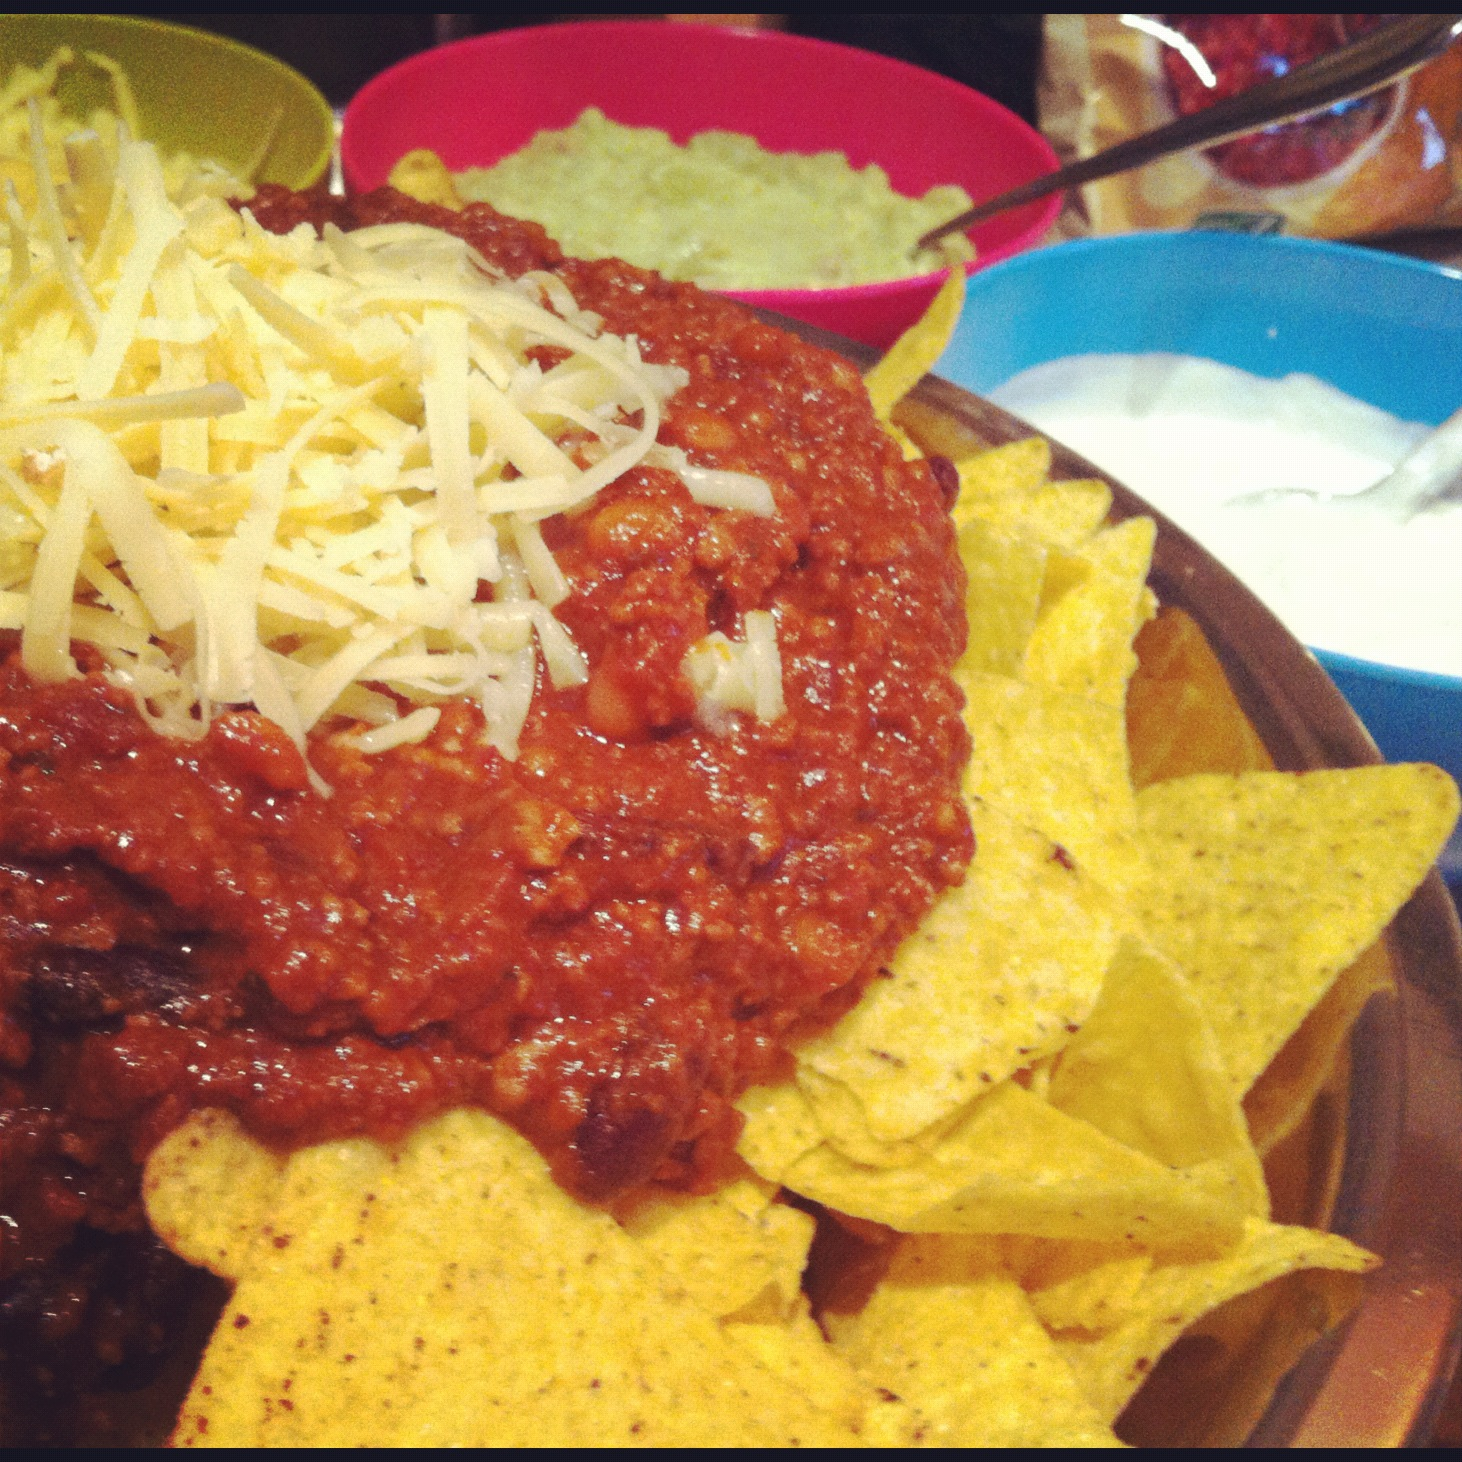 Spicy Loaded Nachos with Homemade Guacamole | Vixxy P's